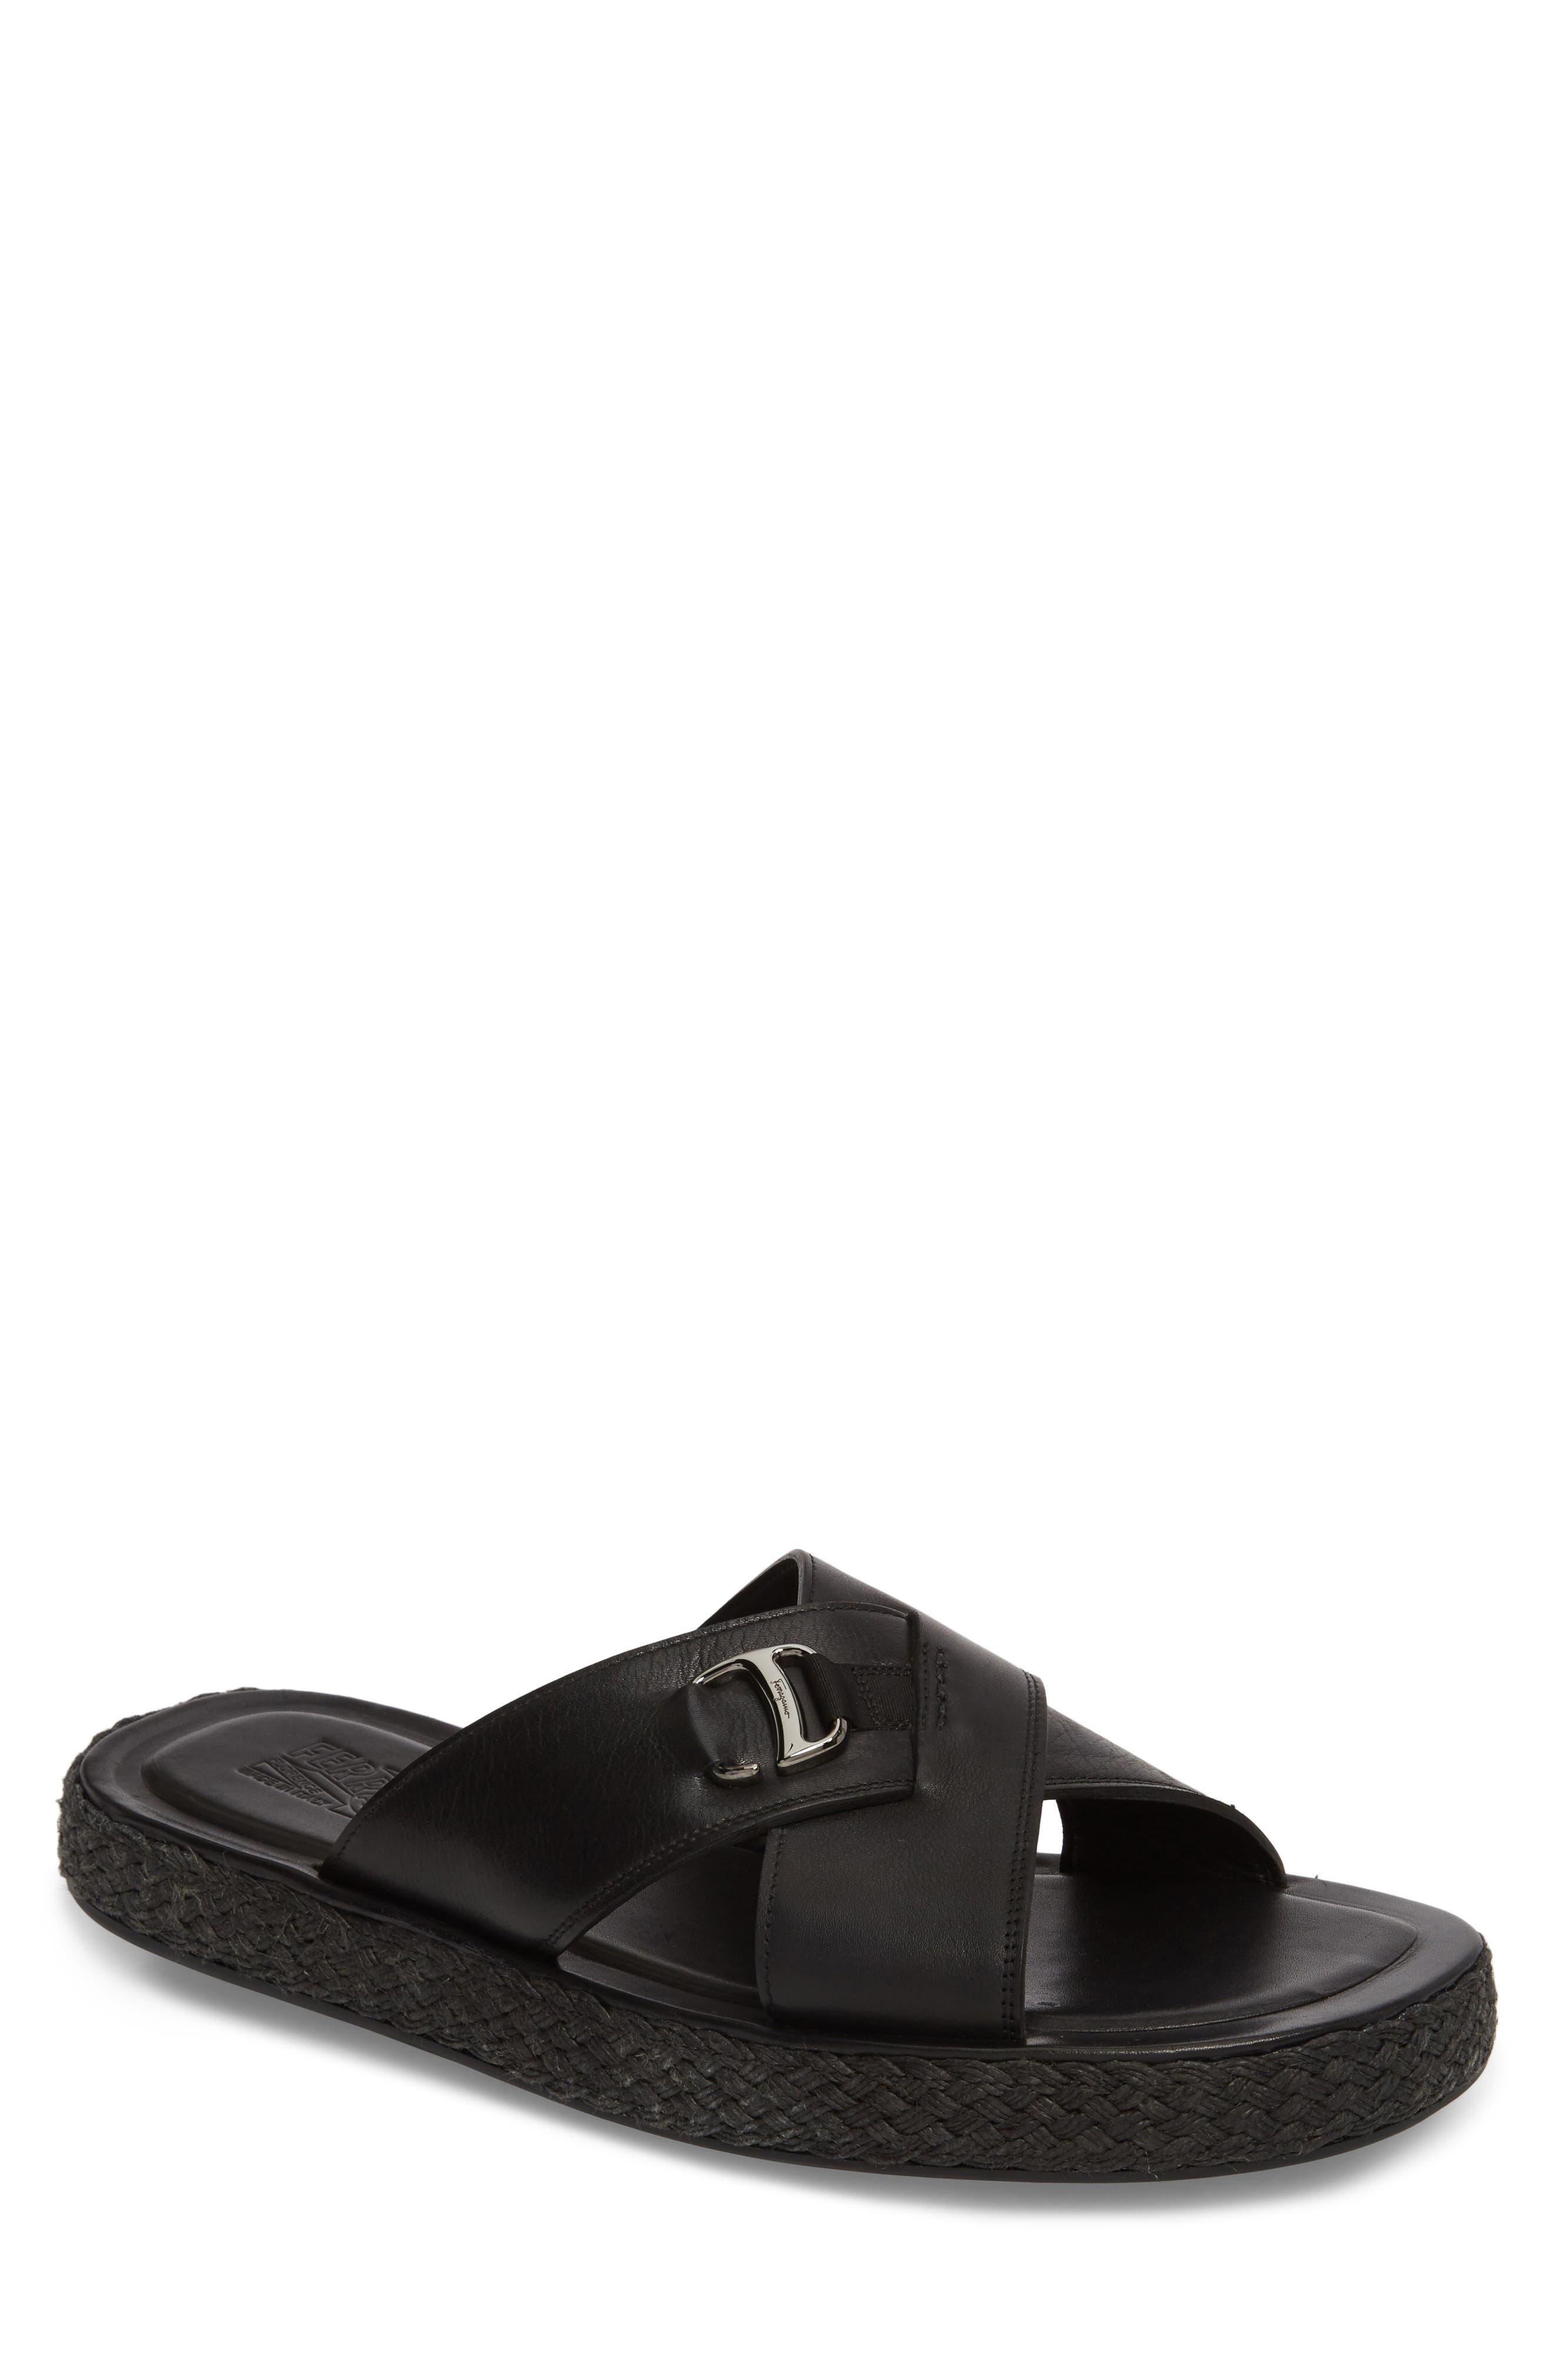 Comodo Slide Sandal,                         Main,                         color, Nero